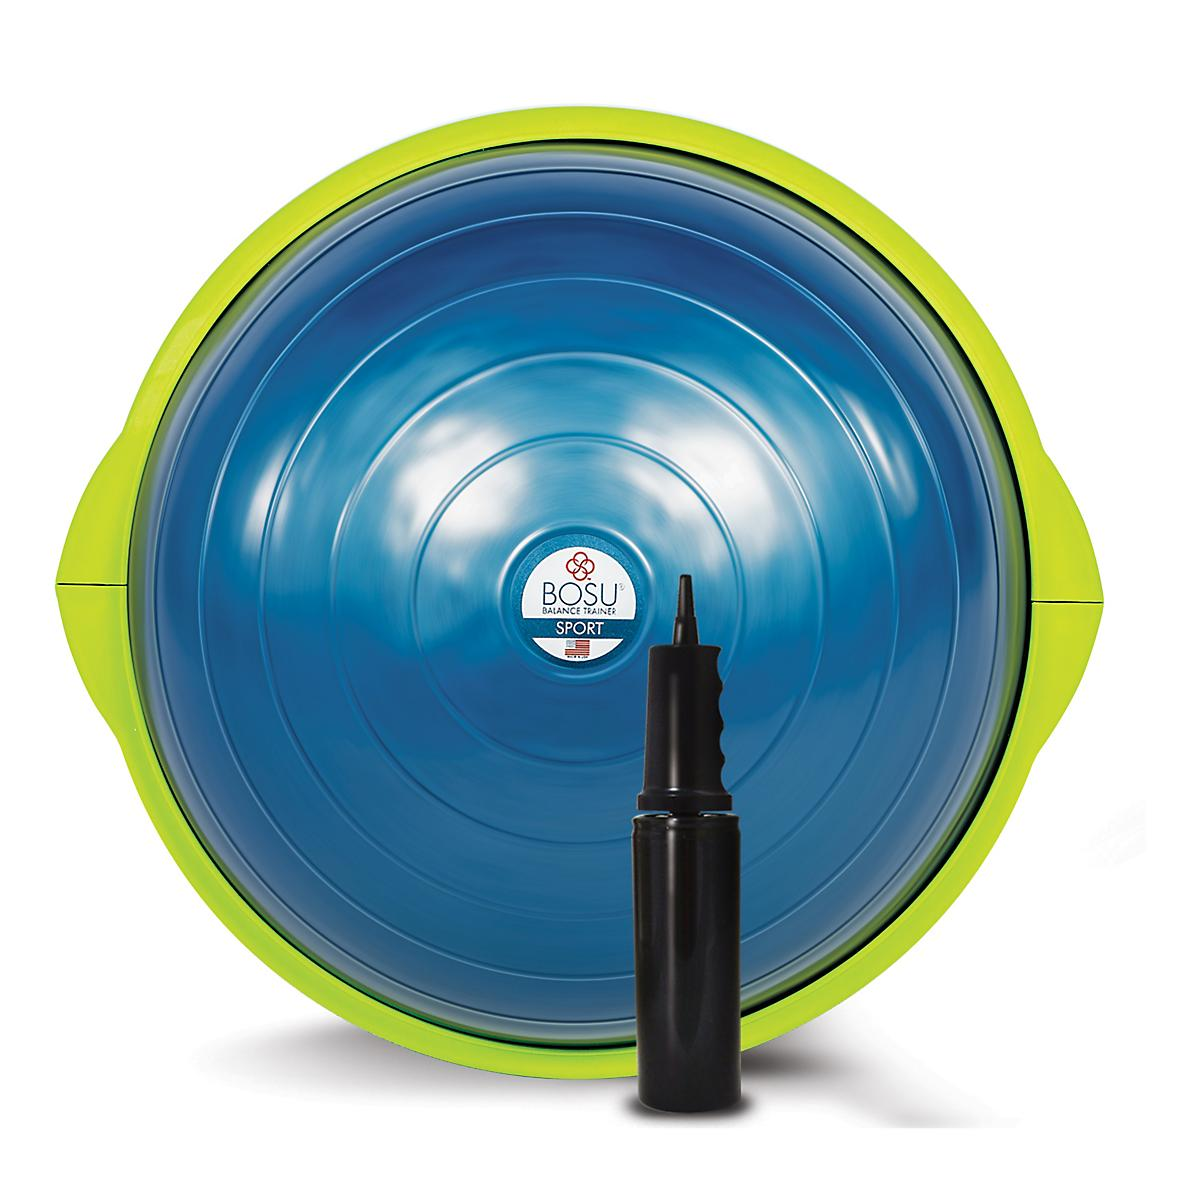 Ball Bounce and Sport Inc�Bosu Balance Trainer Sport